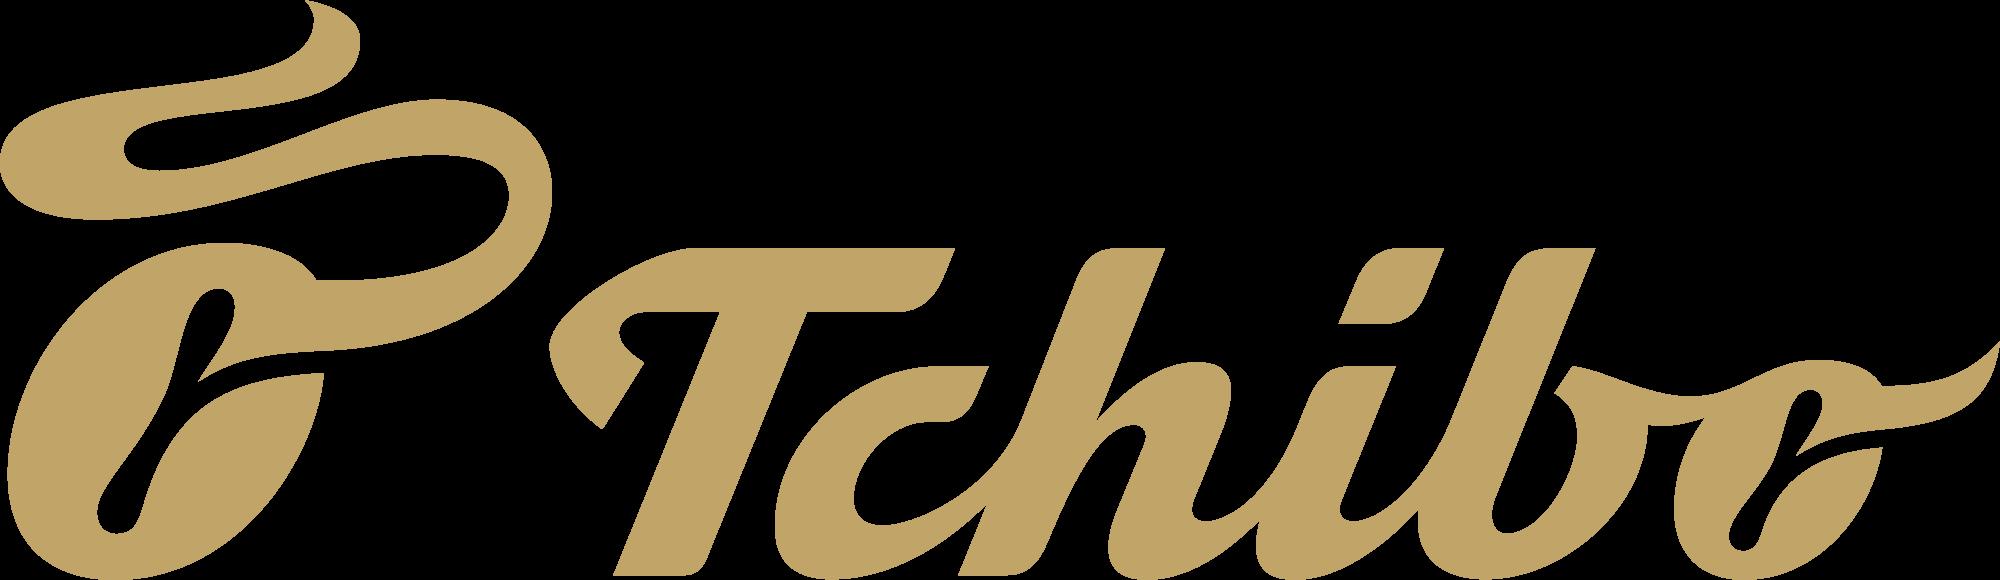 Tchibo_Logo-hor_Gold-dark_sRGB